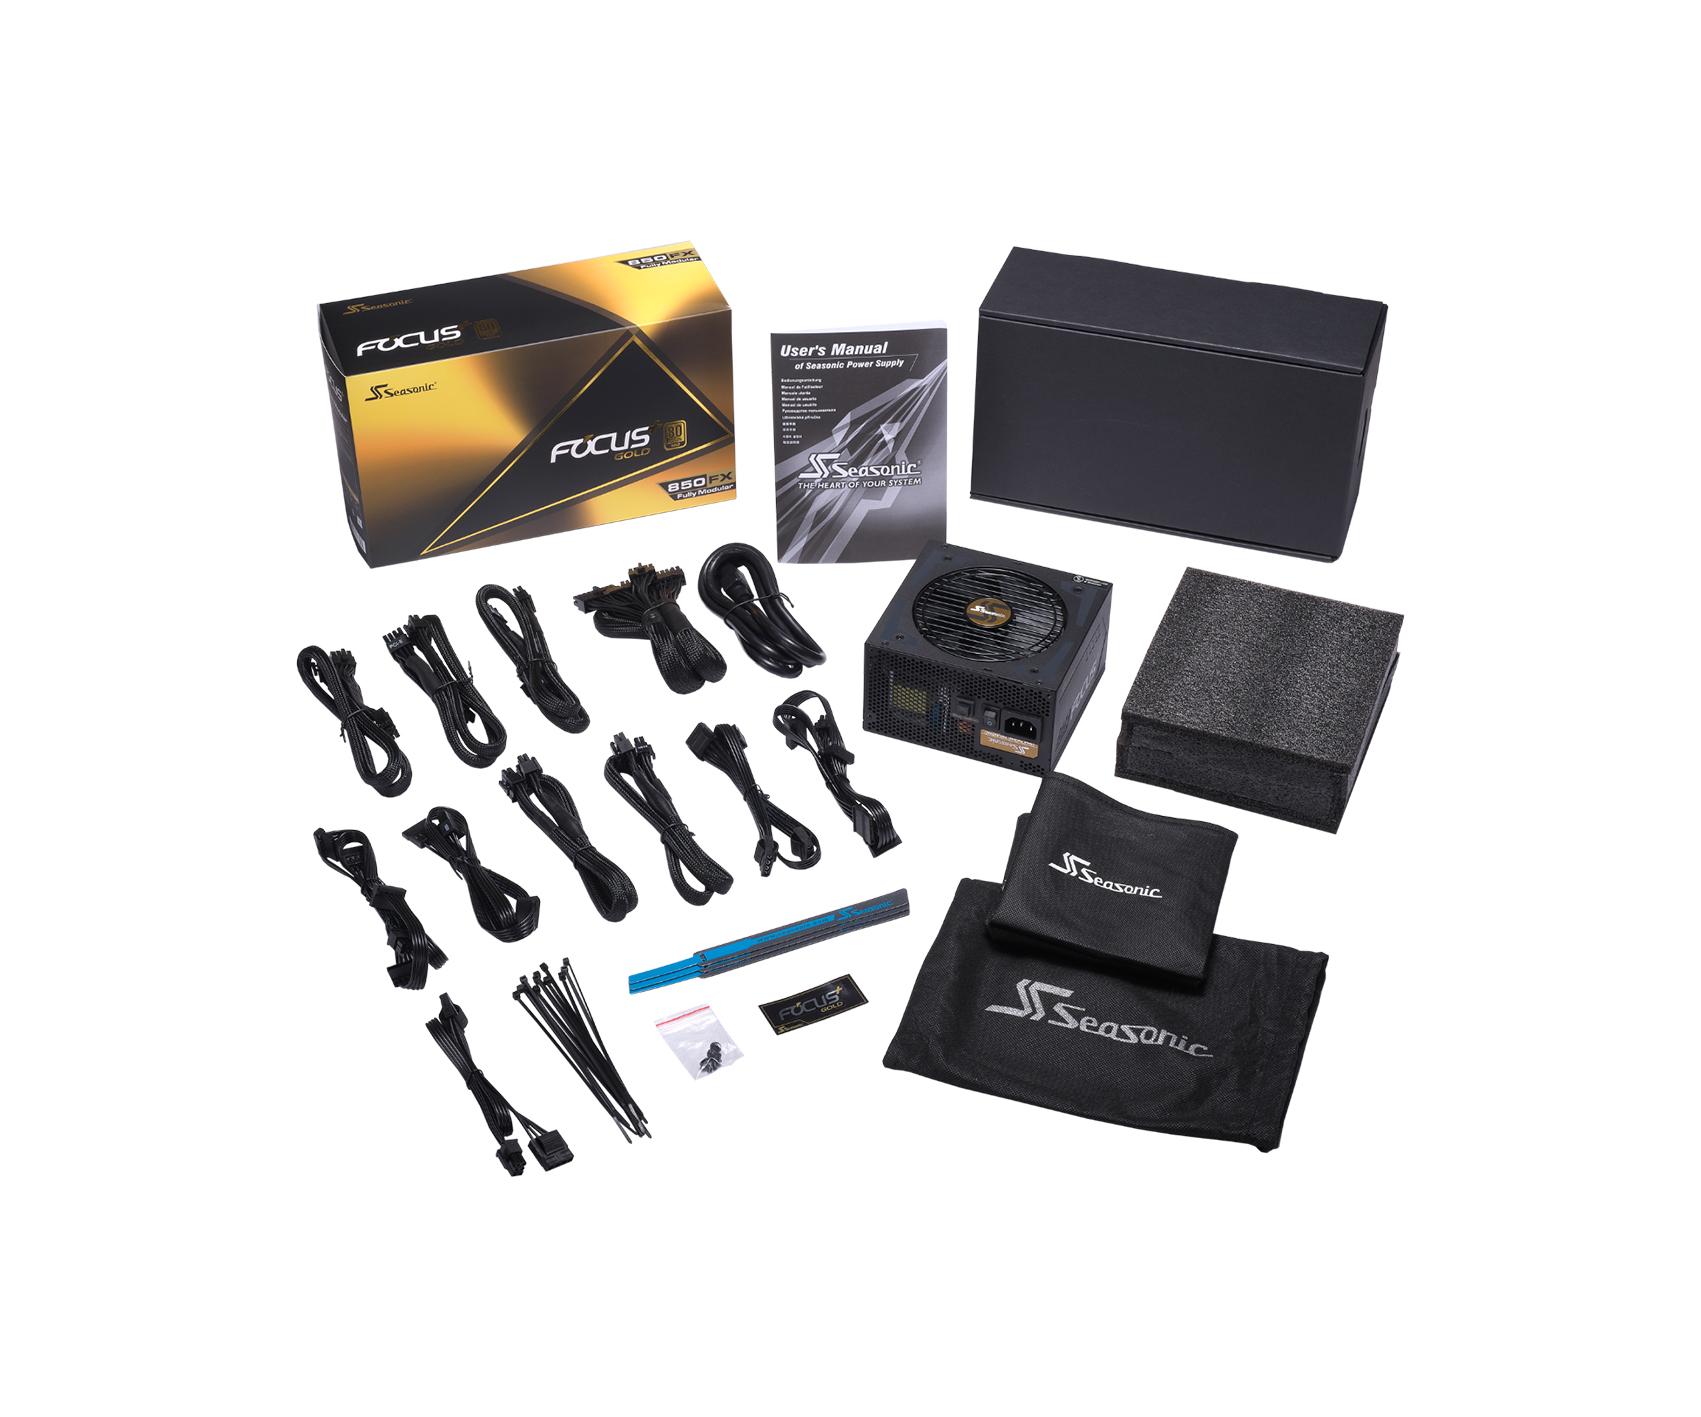 Seasonic FOCUS PLUS 850W 80 Plus Gold Certified Full Modular Power Supply